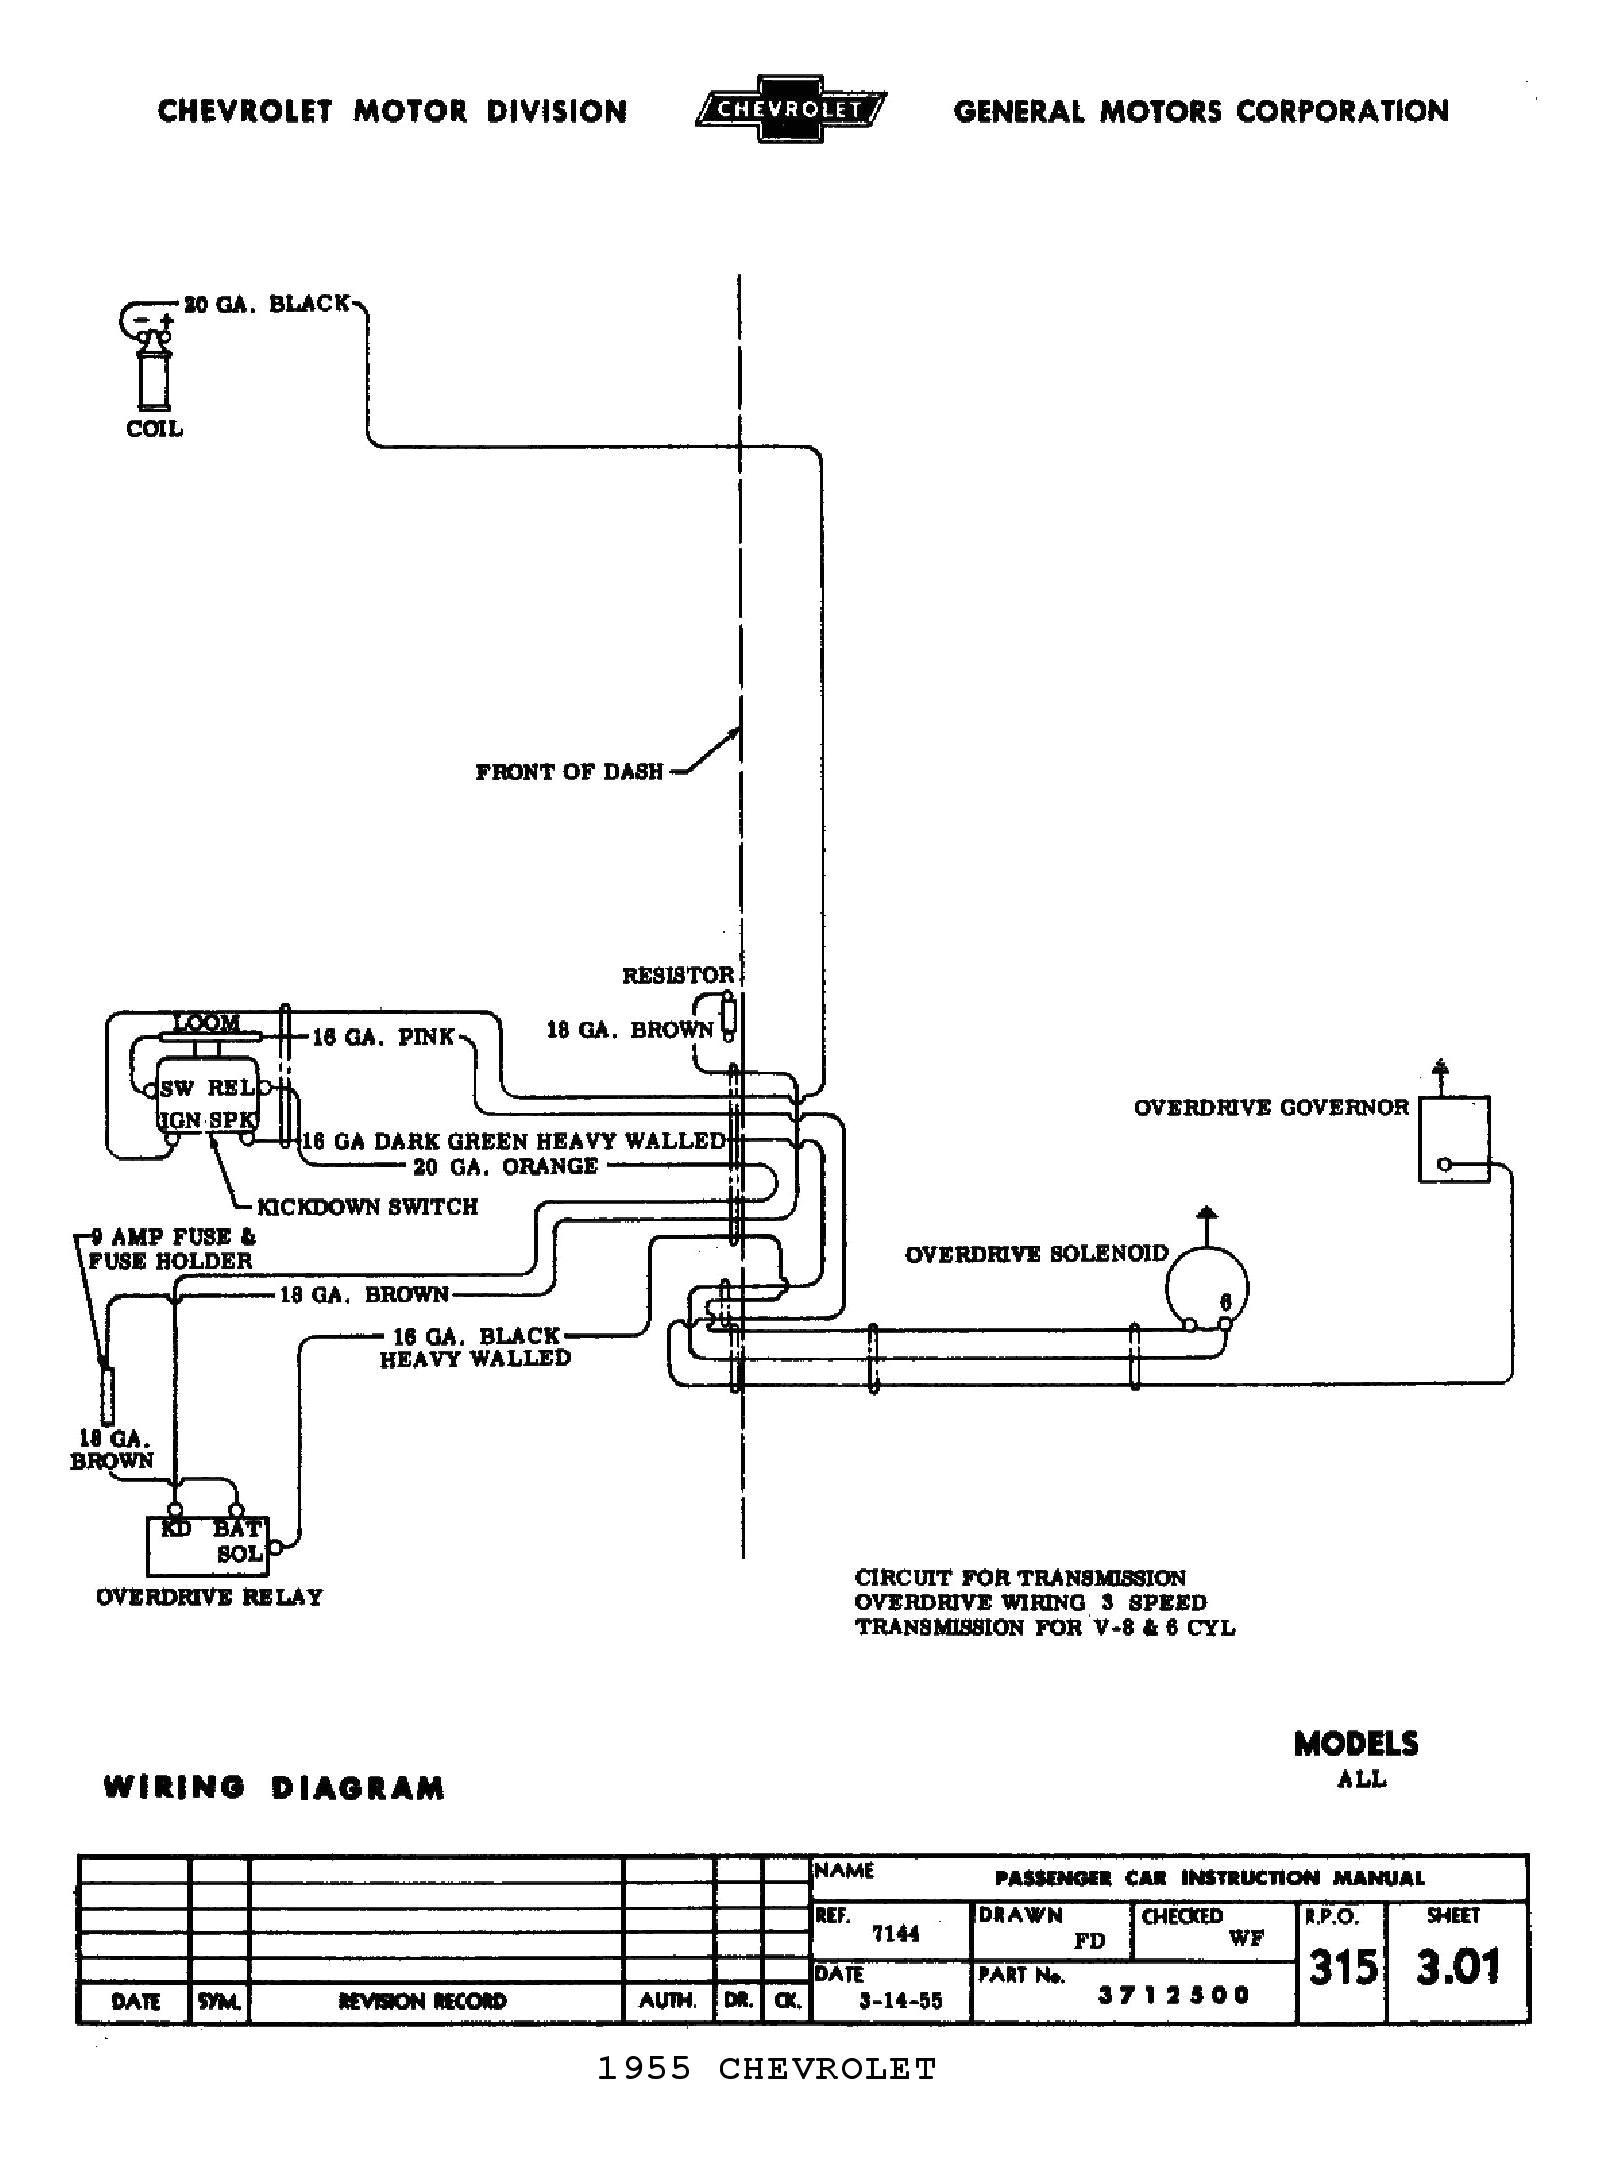 ididit wiring diagram wiring diagramswiring diagram ididit steering column simple data diagram schematic ididit wiring diagram